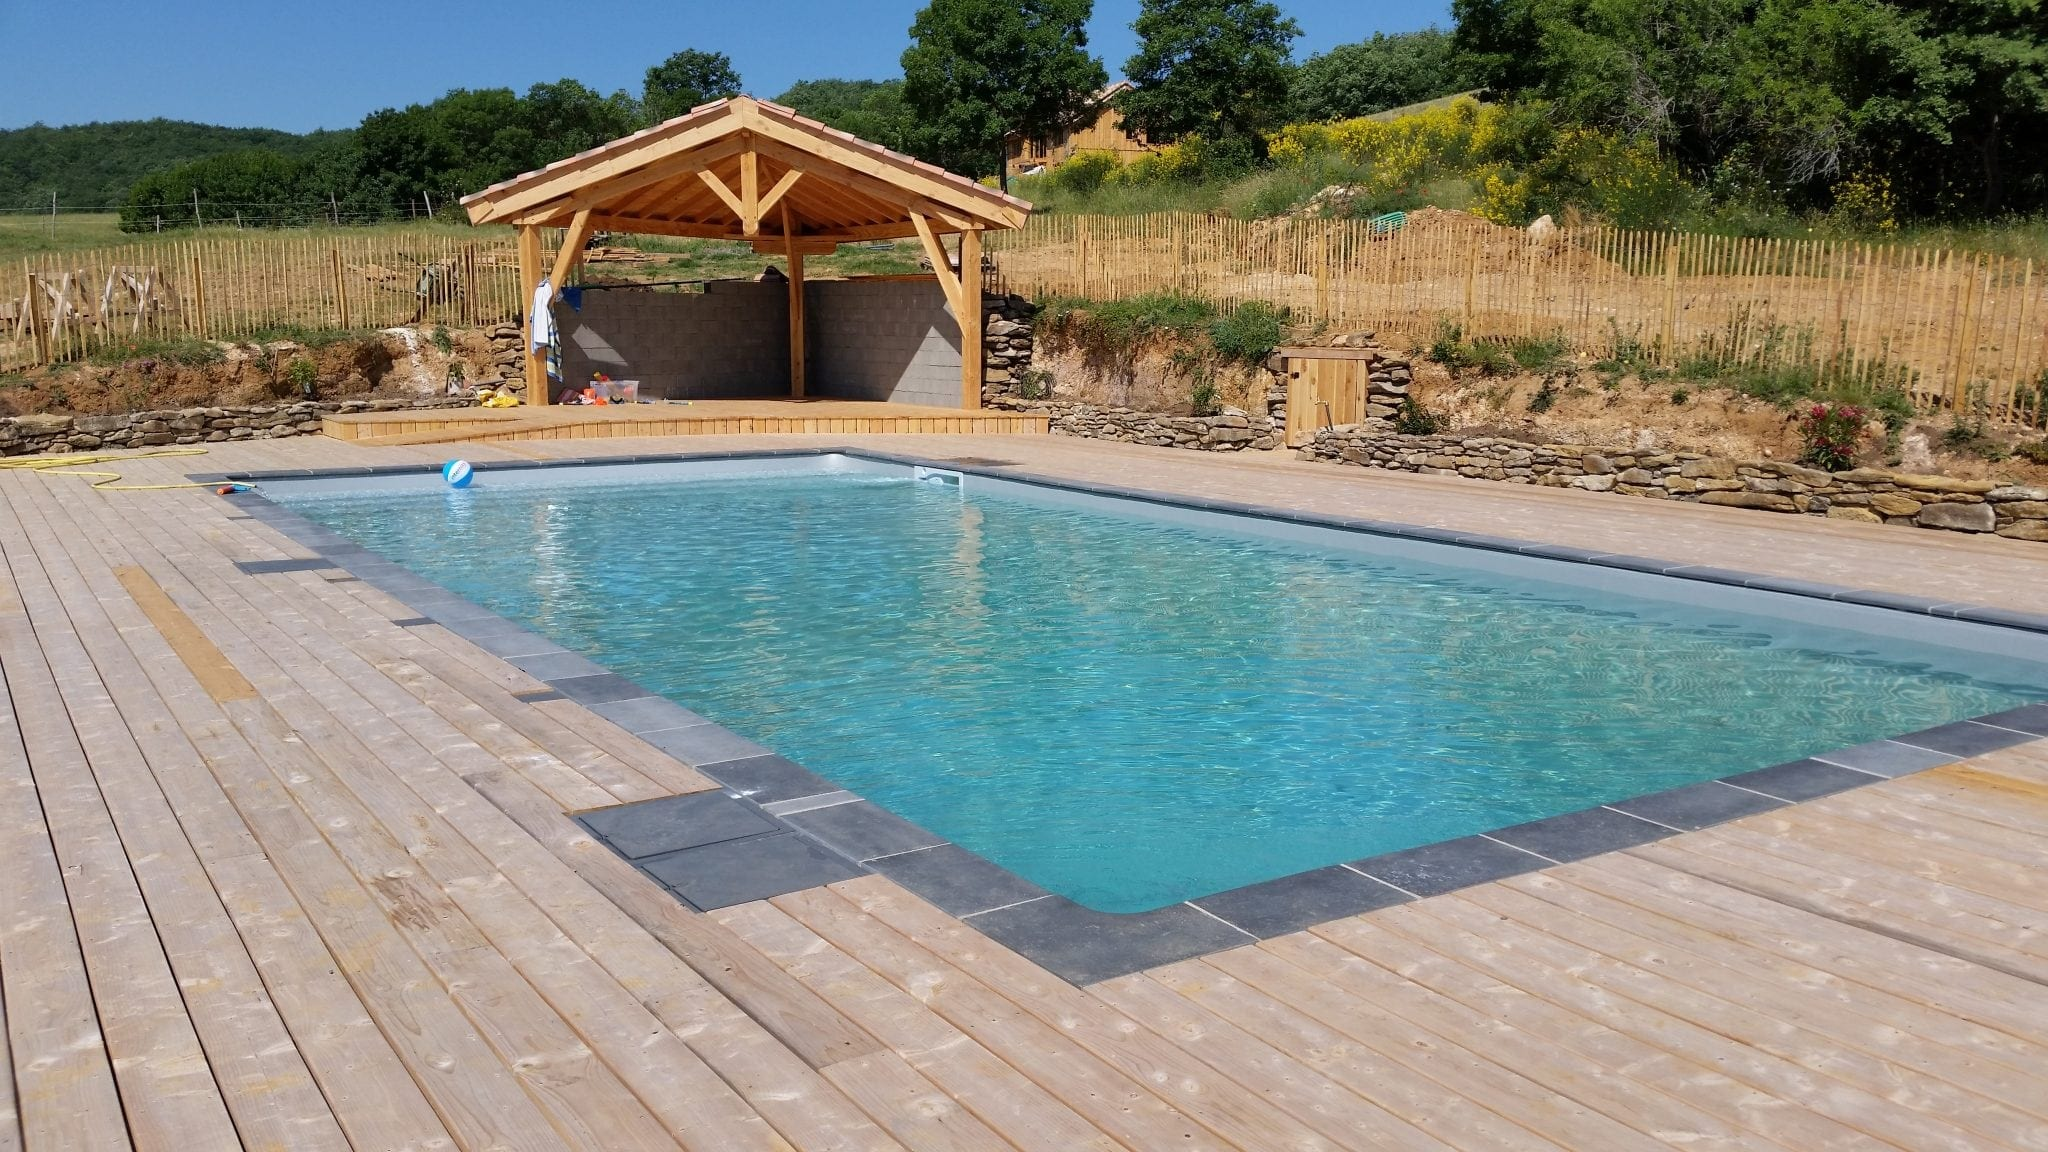 Renovation piscine narbonne dallage bois 25 btv piscine for Renovation piscine